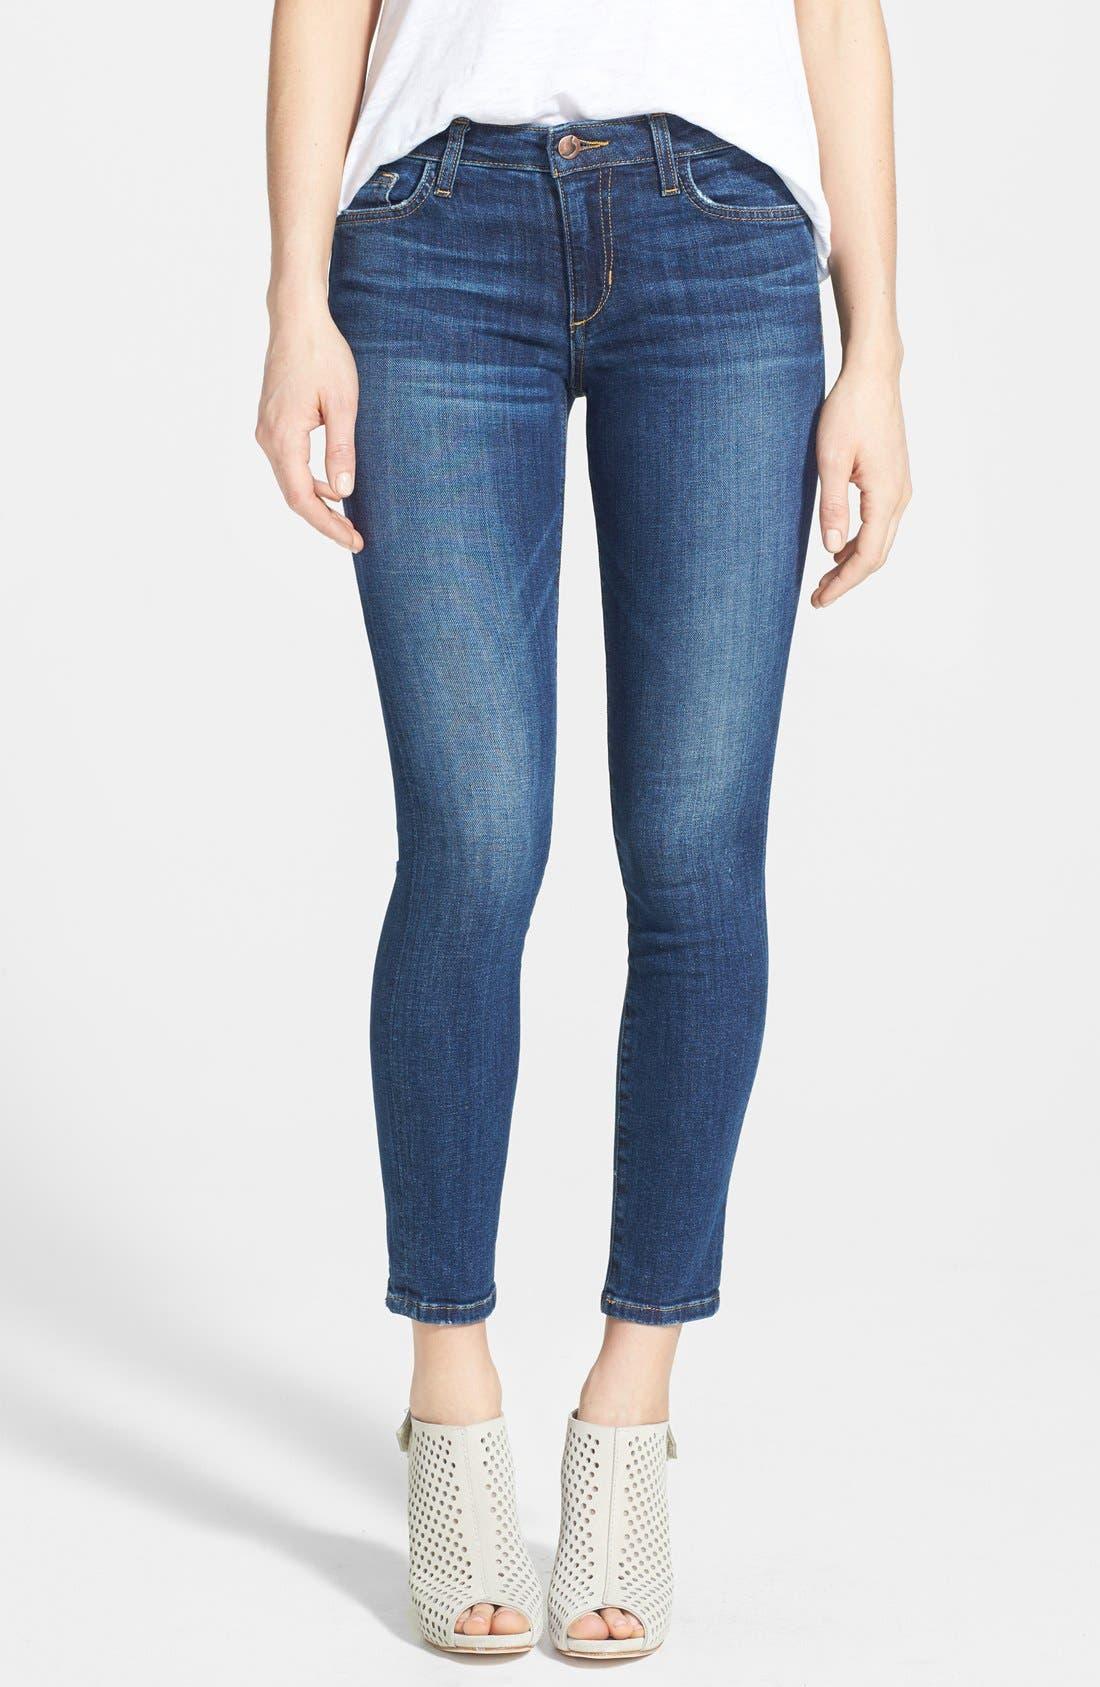 Alternate Image 1 Selected - Joe's Ankle Skinny Jeans (Aubree)